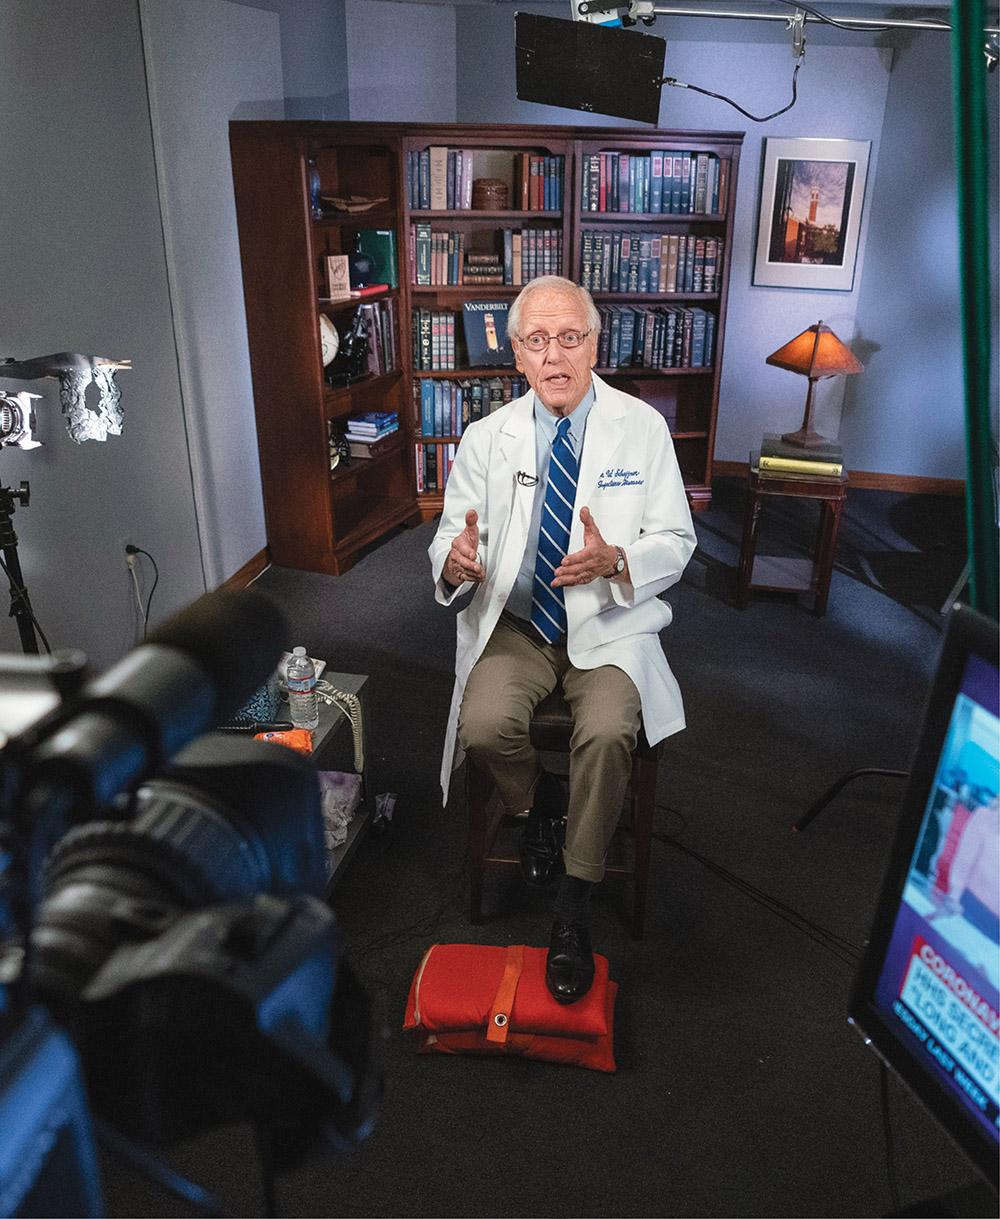 photo of William Schaffner being interviewed on camera from Vanderbilt's broadcast facility